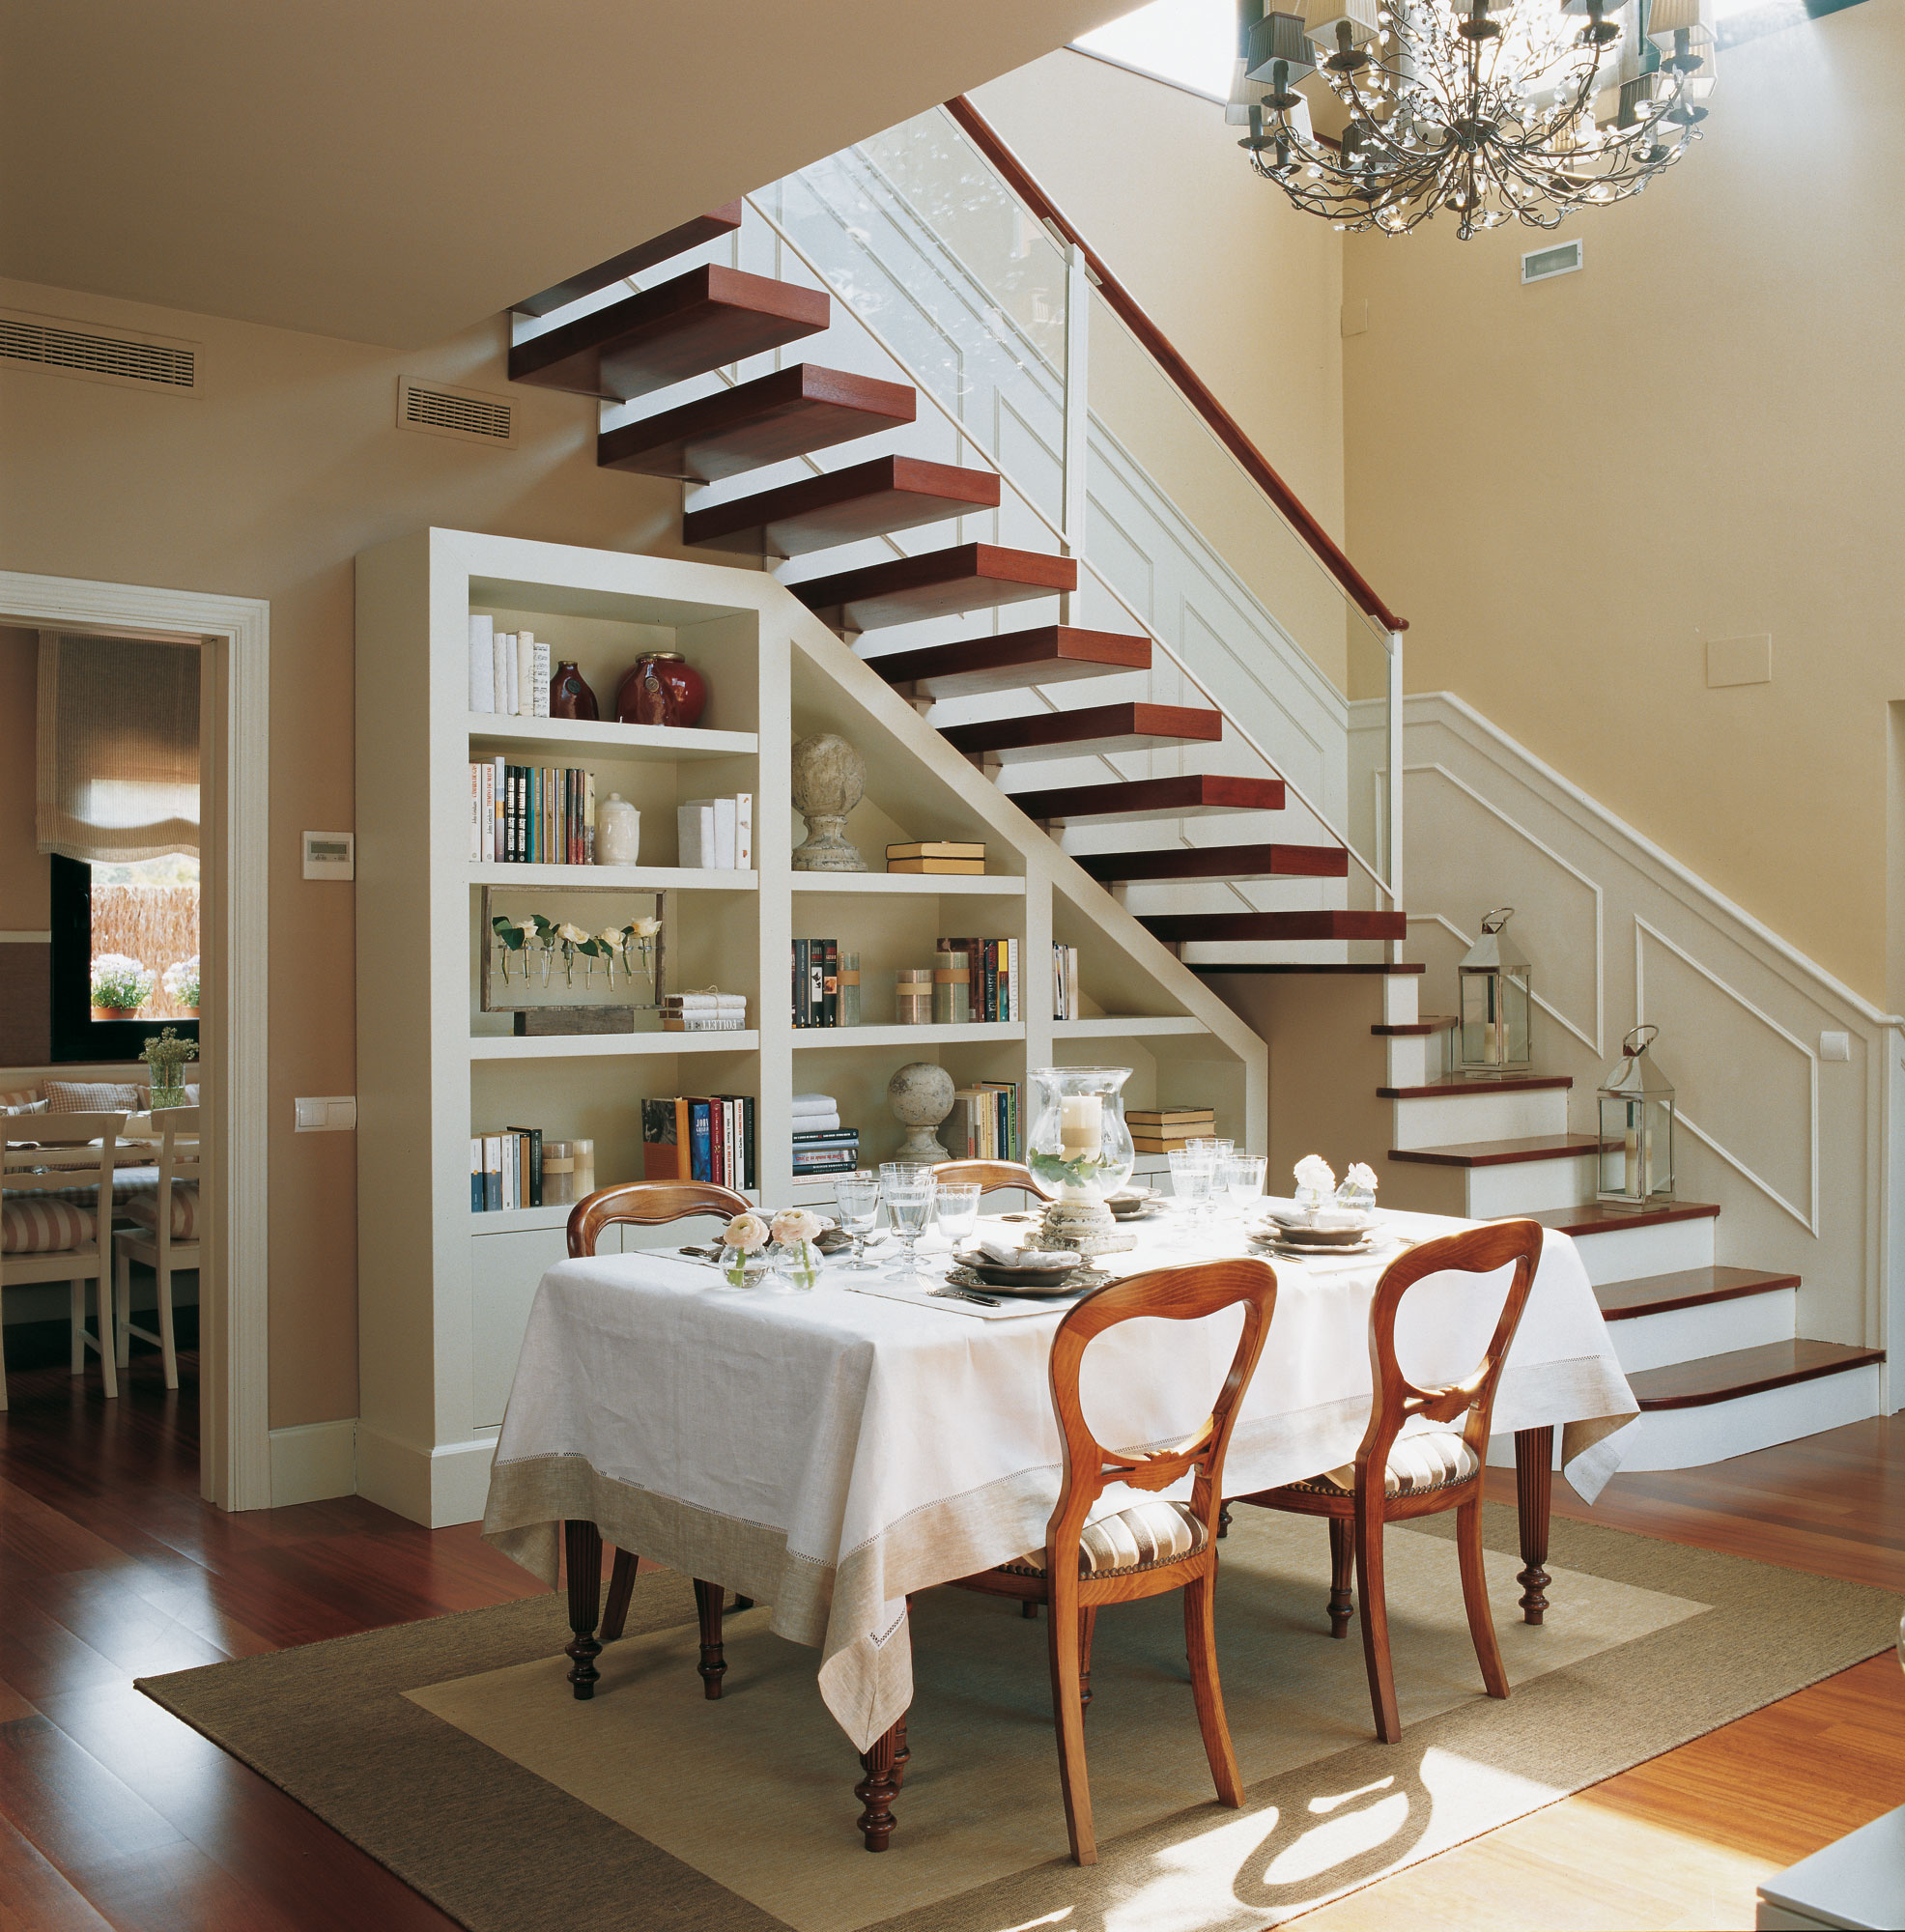 Aprovecha el hueco bajo la escalera for Escaleras de sala